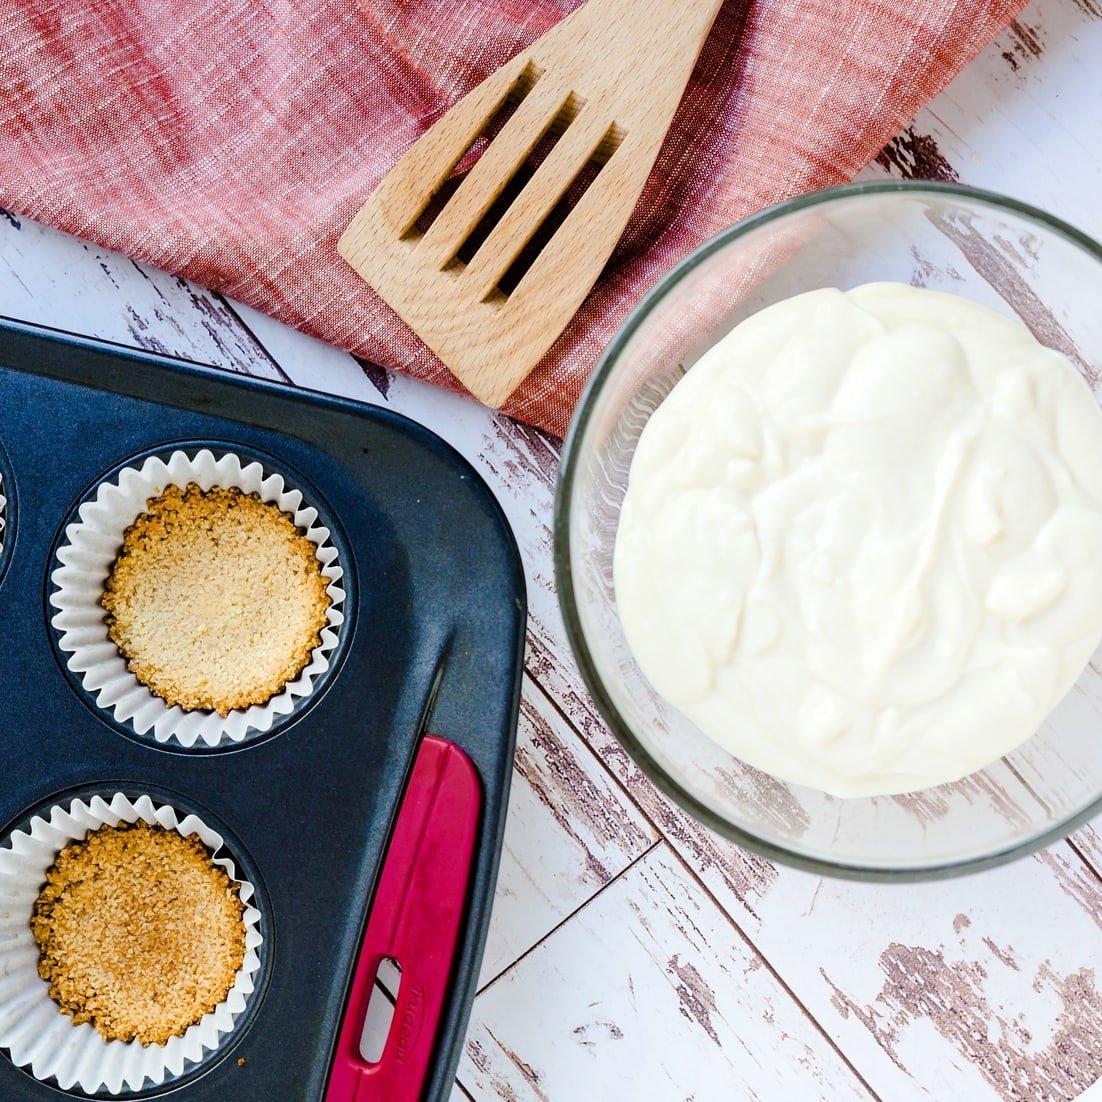 ingredients for keto tofu cheesecake before baking